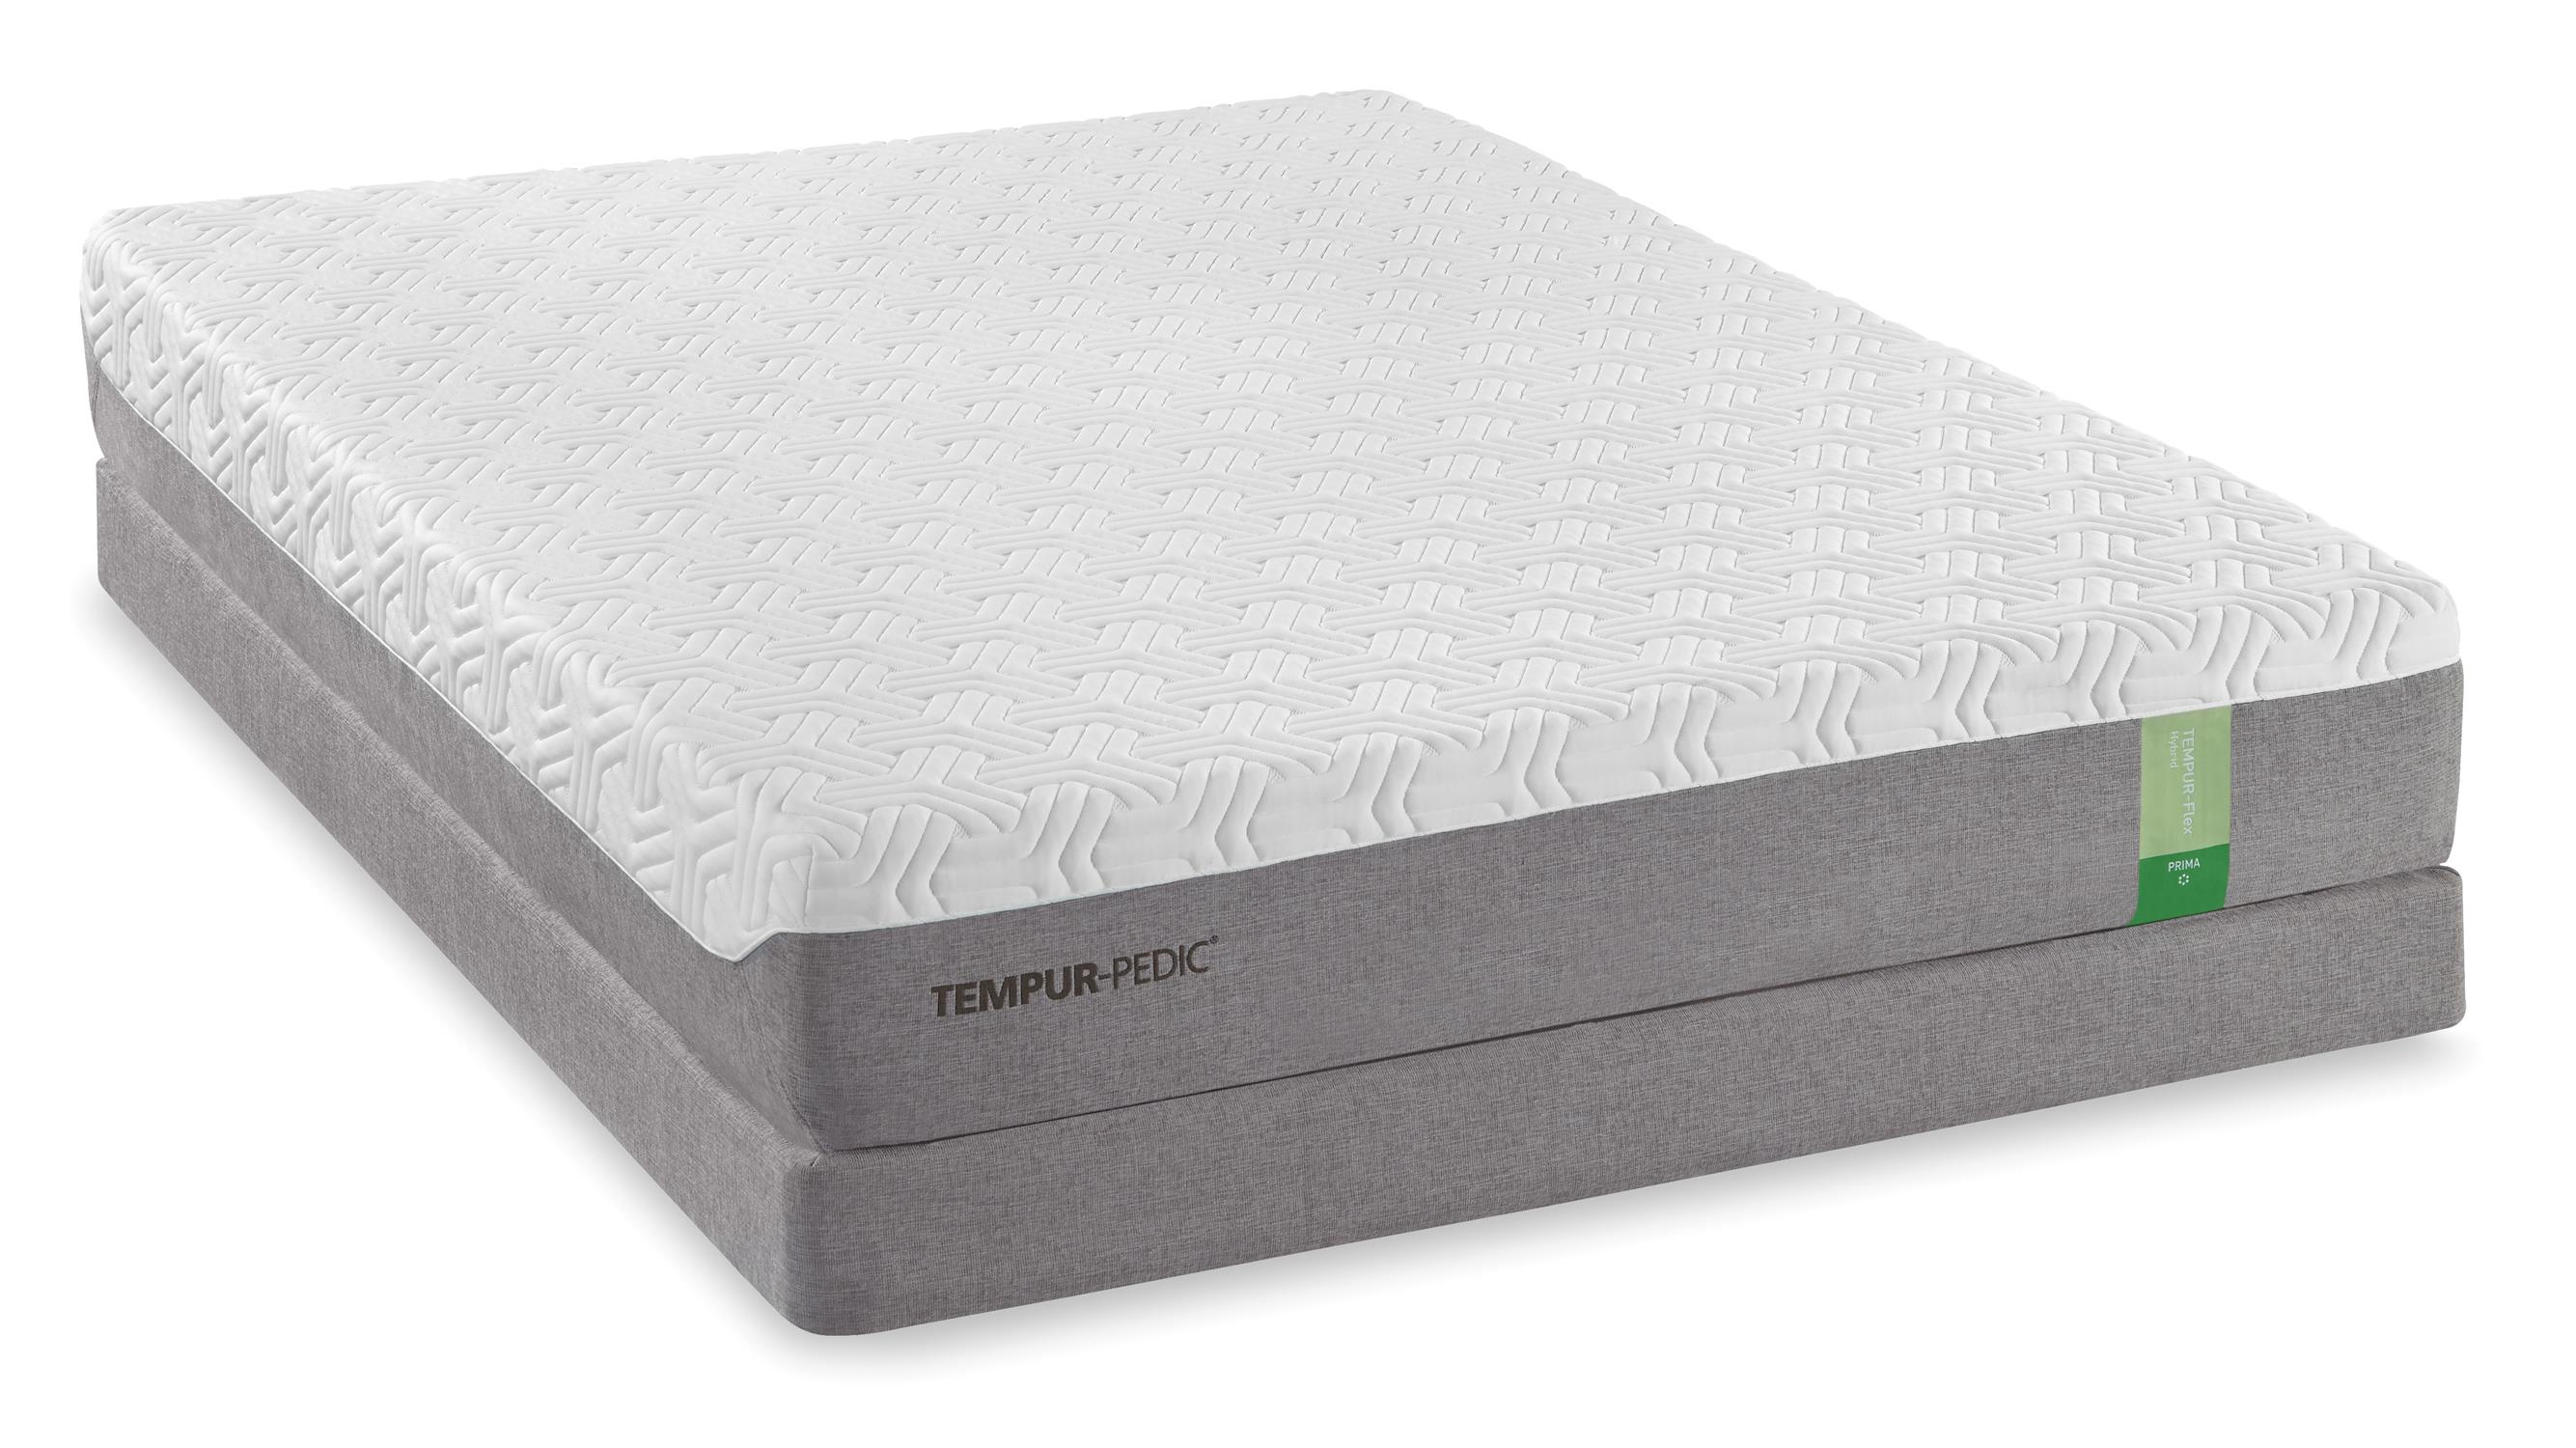 Tempur-Pedic® TEMPUR-Flex Prima Cal King Medium Firm Mattress Set - Item Number: 10115280+2x21510190